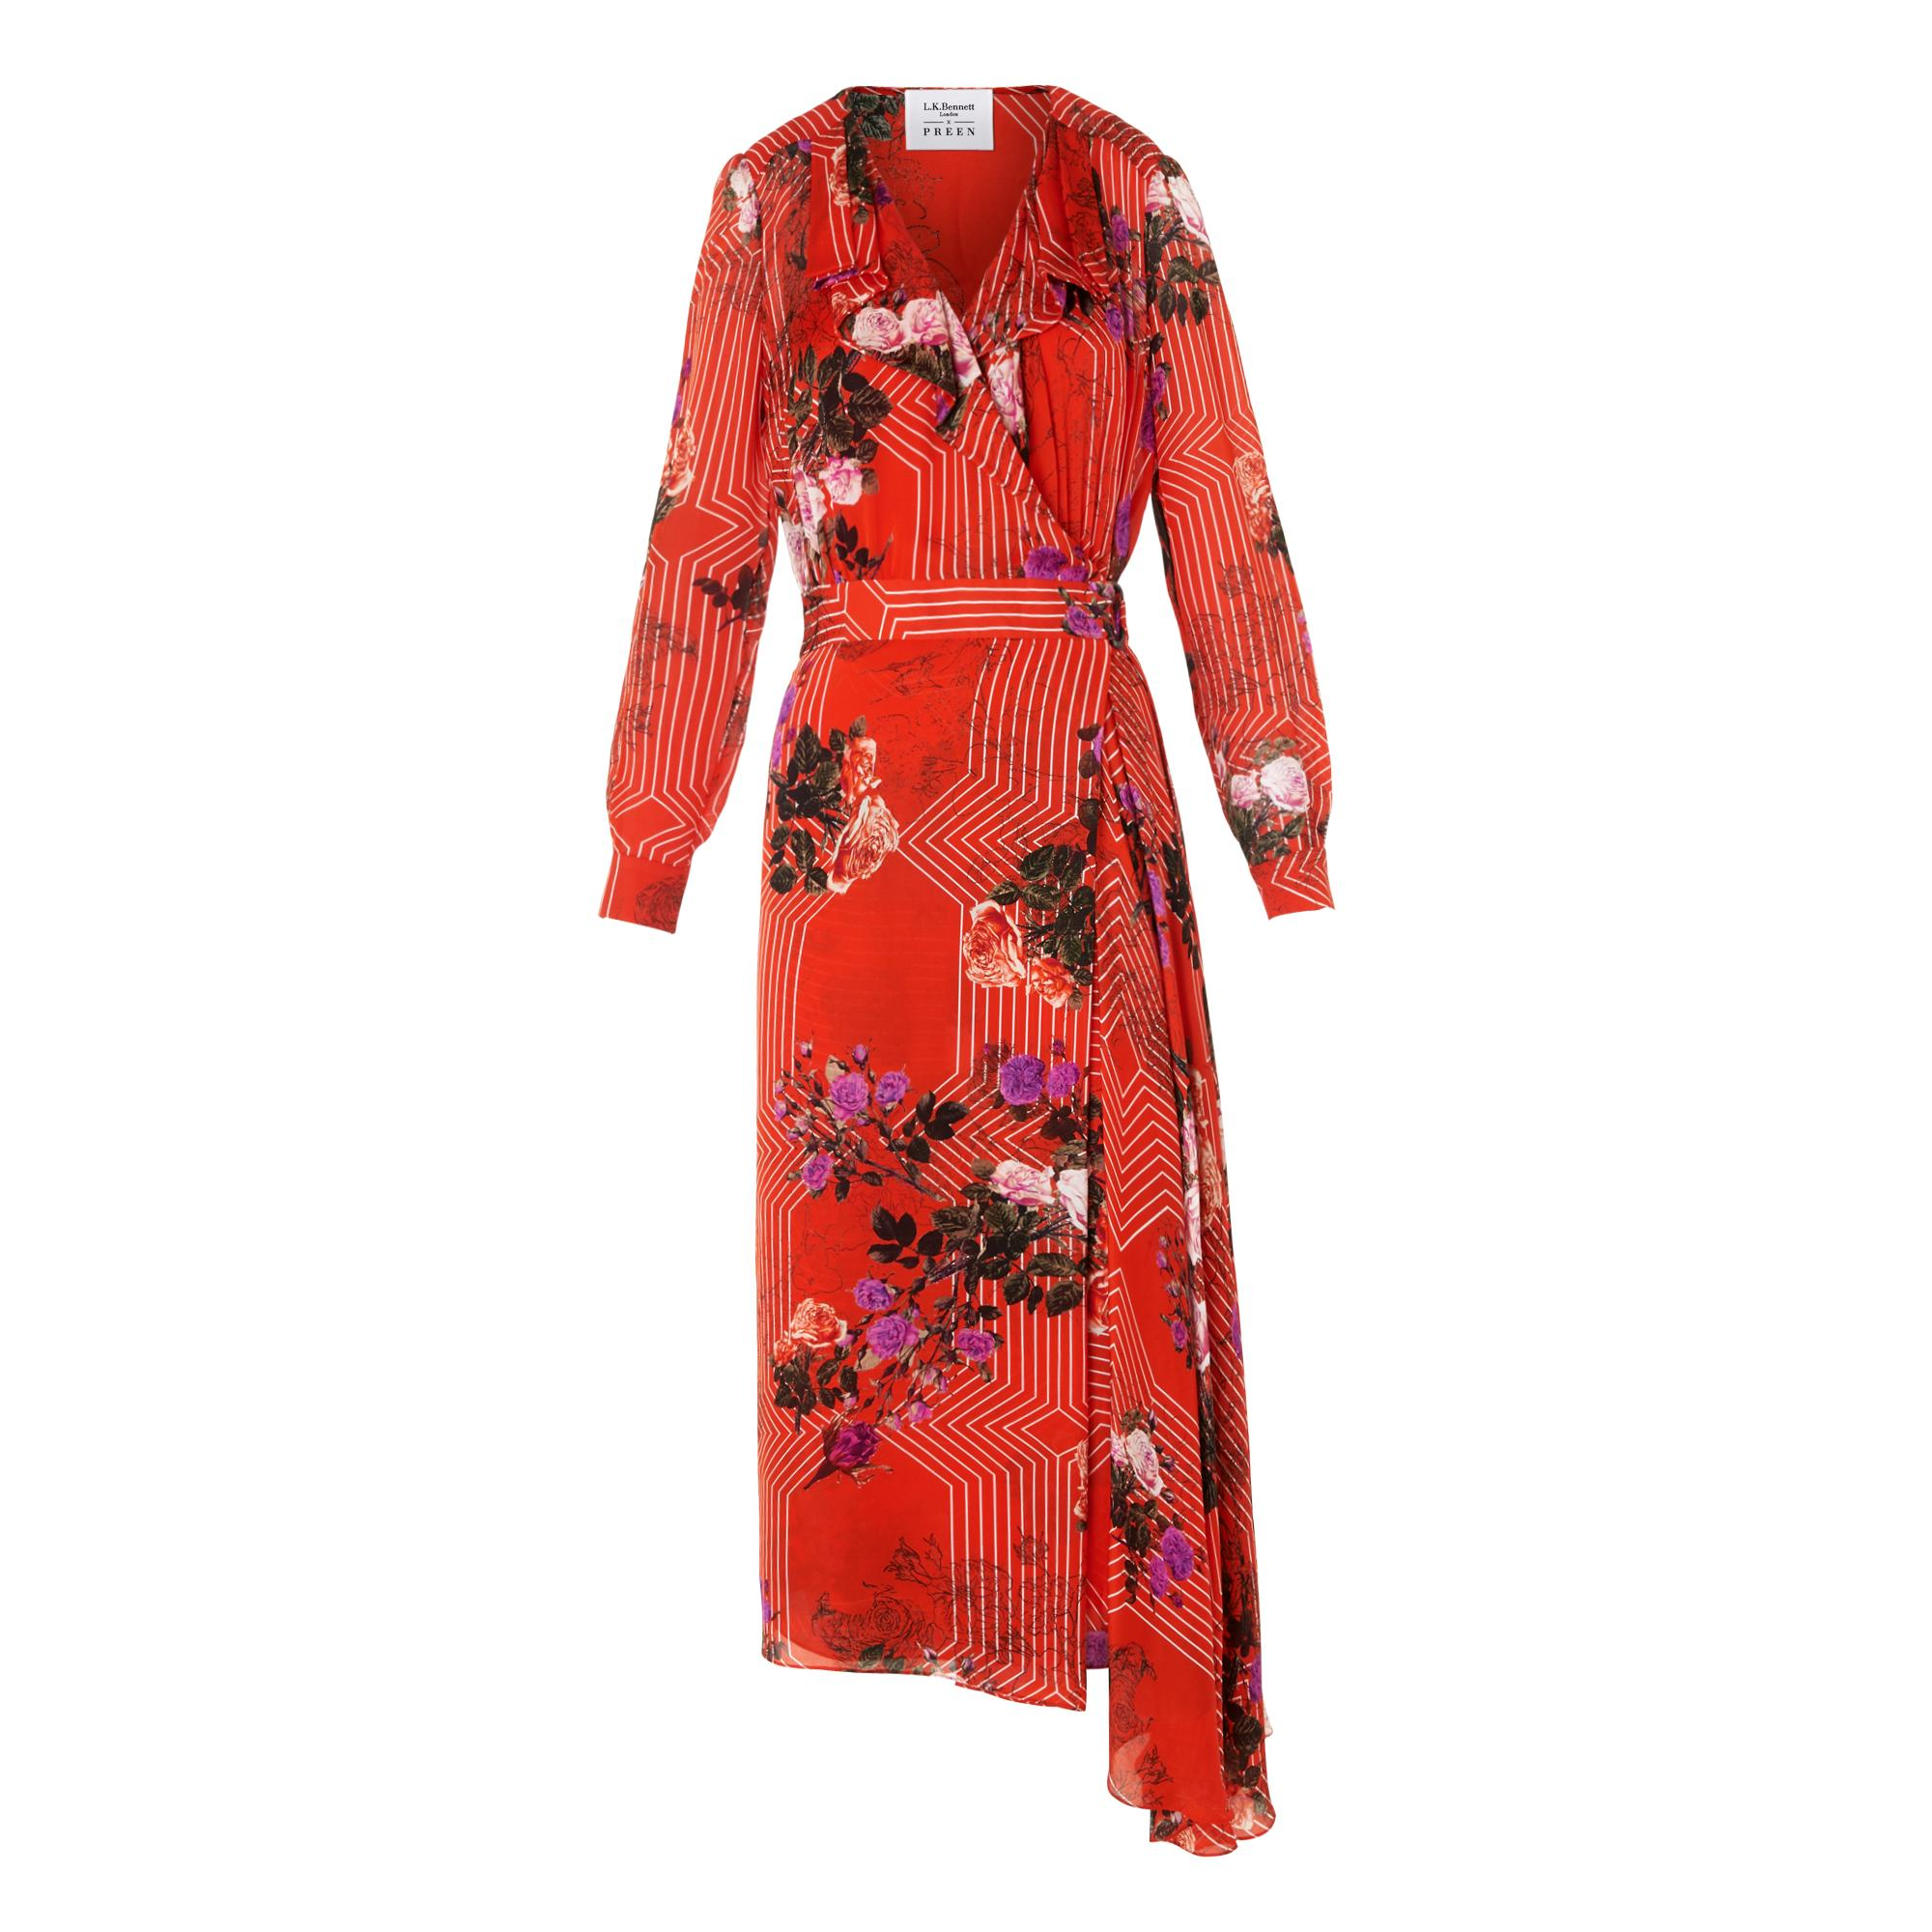 Vali Floral Print Dress